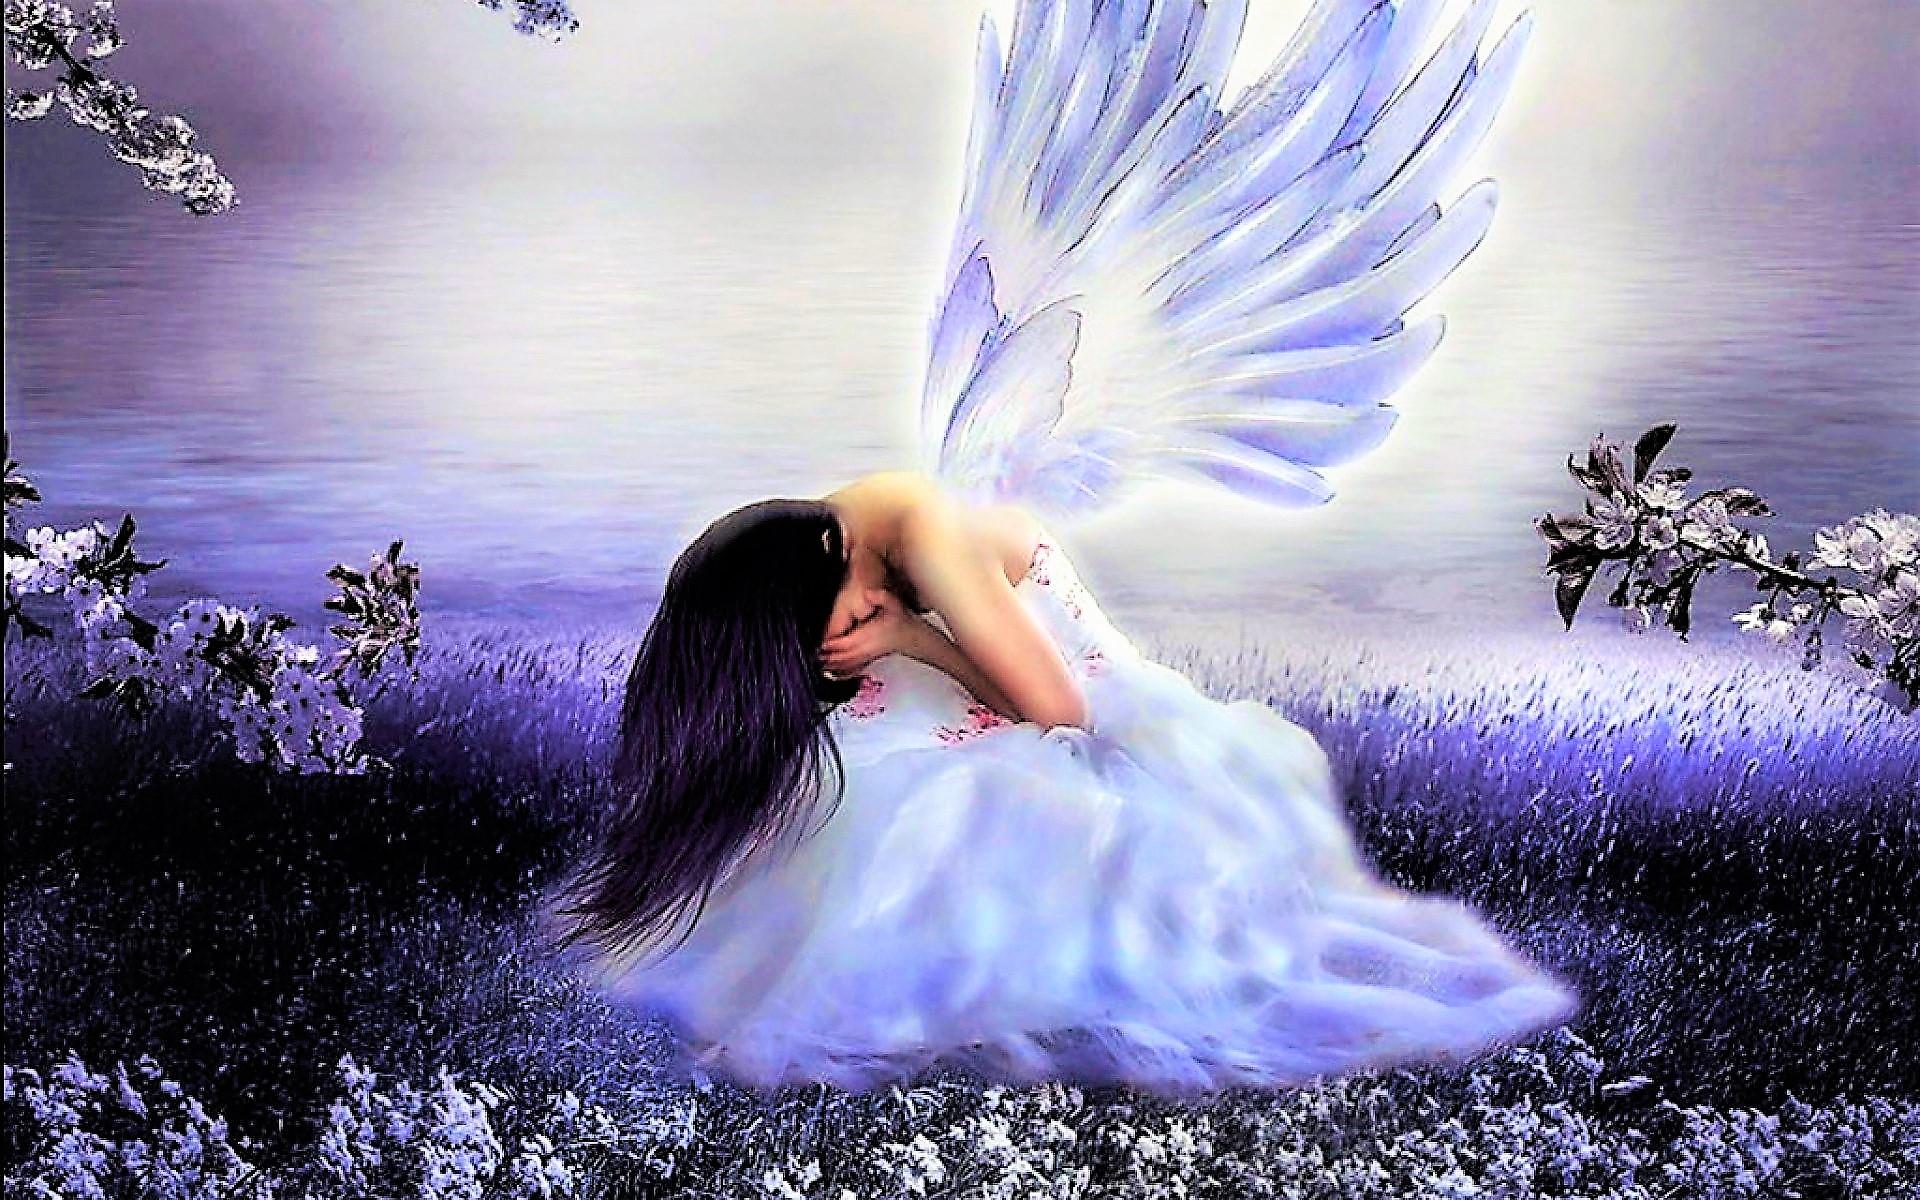 Sad angel image id 198602 image abyss - Sad angel wallpaper ...